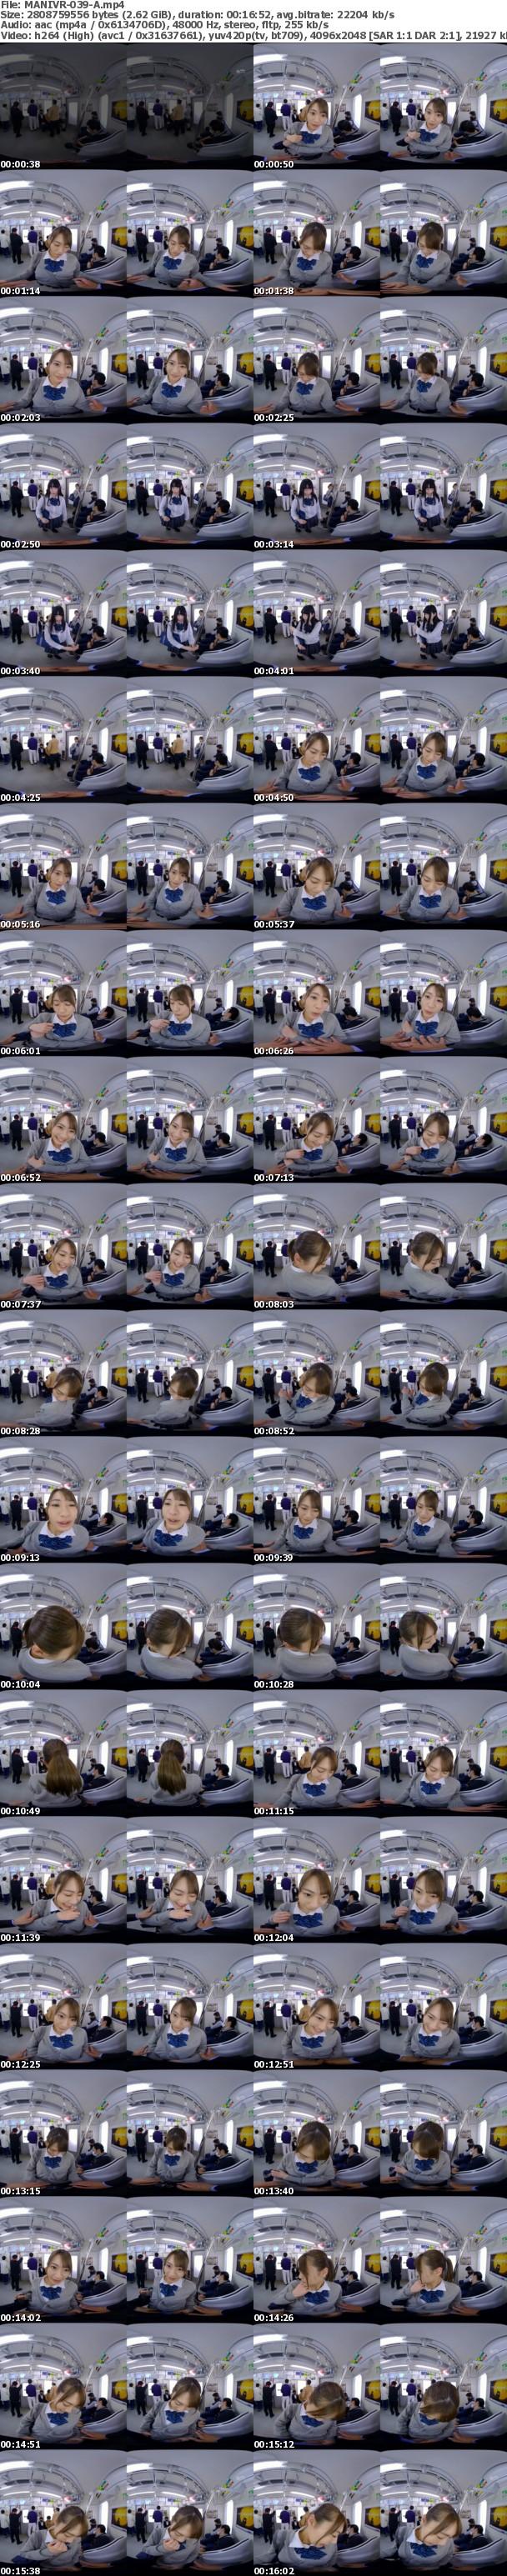 (VR) MANIVR-039 「もうゴム無いから生でするしかないね」教え子に中出しを迫られ放課後ナマ交尾